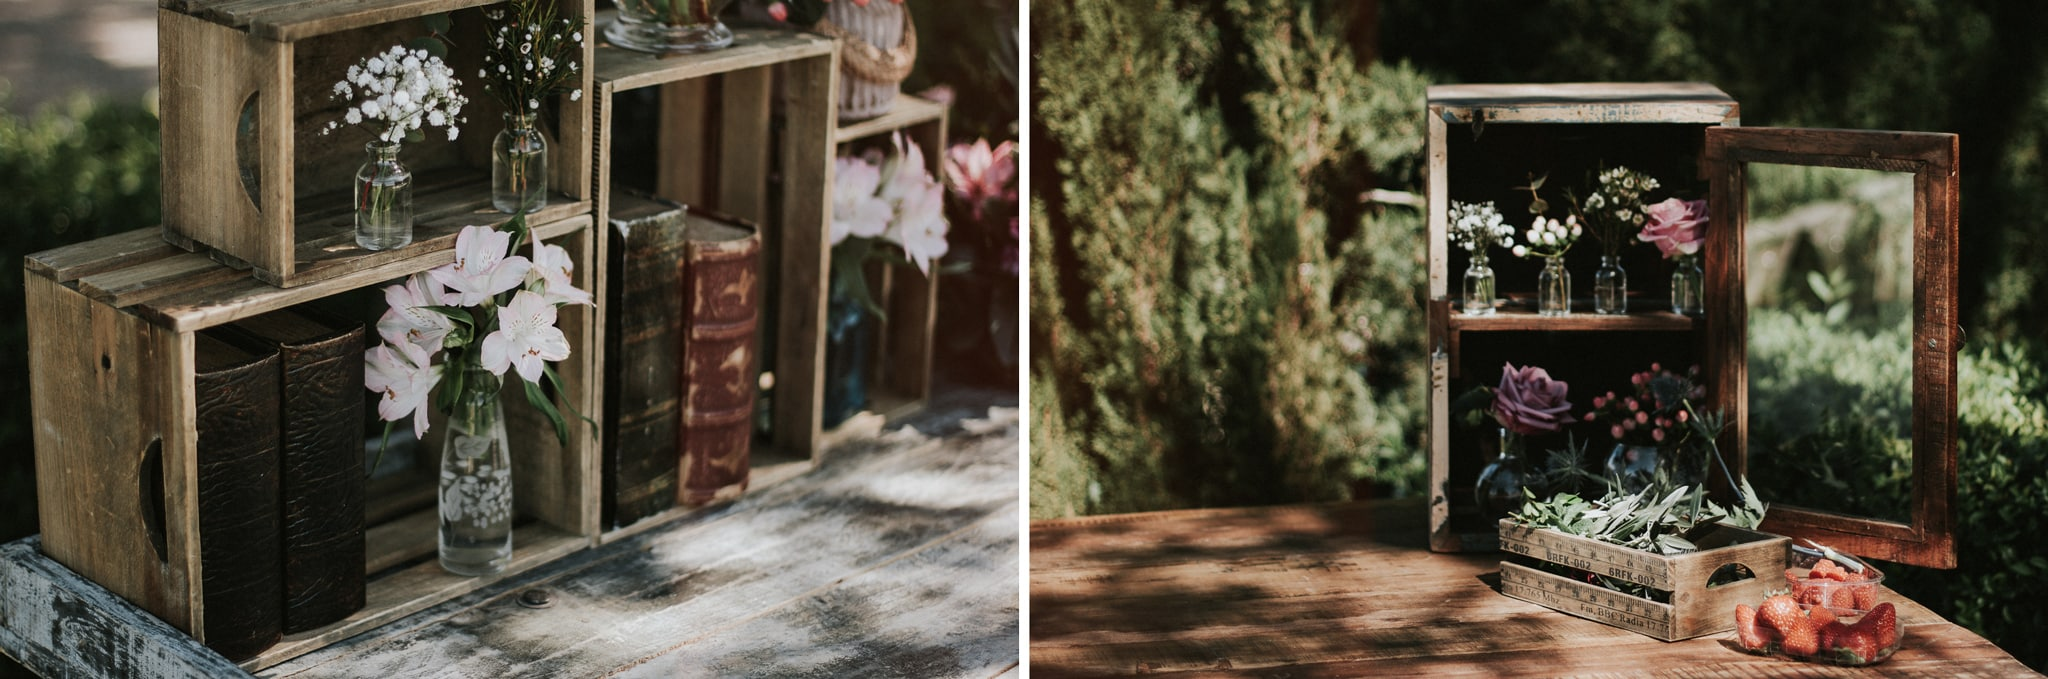 Fotografo-bodas-Cigarral-de-las-Mercedes-40